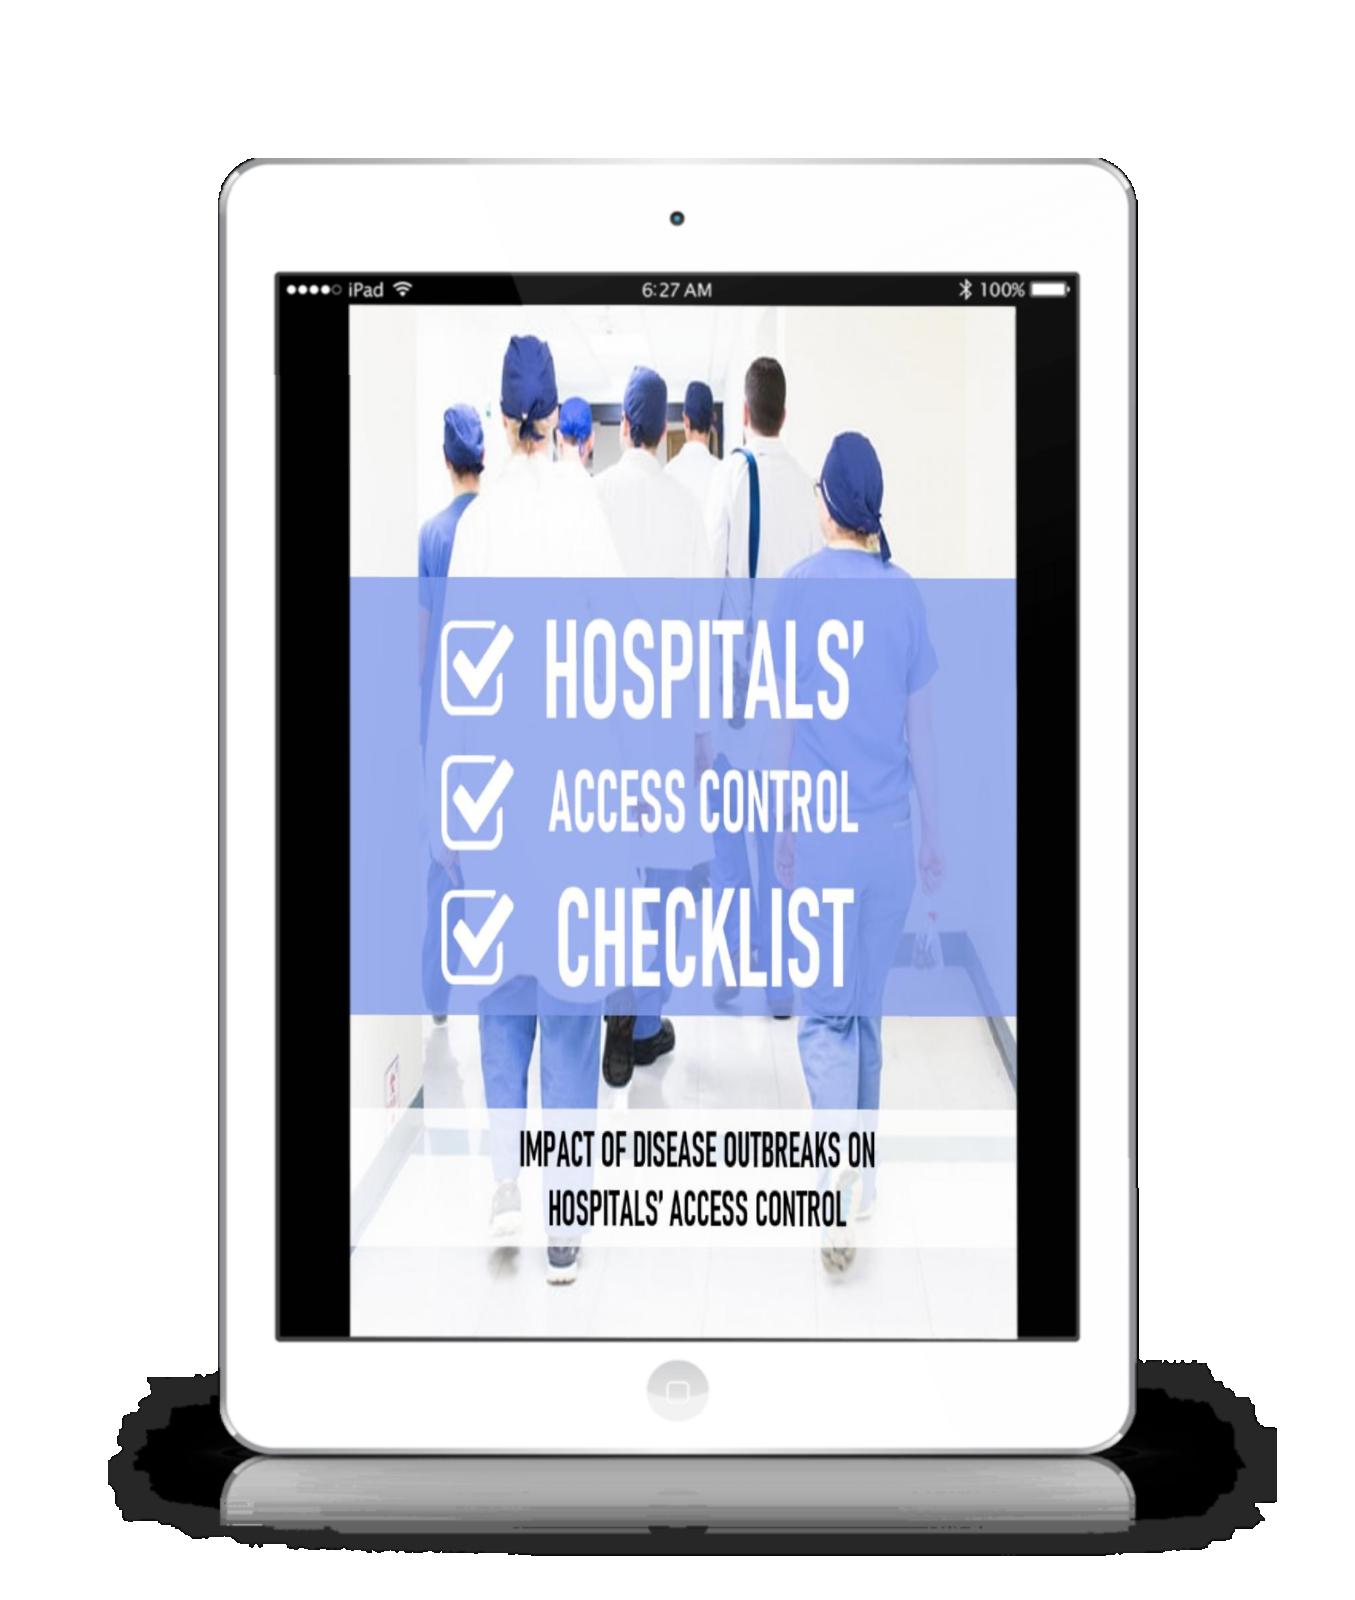 SimonsVoss Technologies - Hospitals Access Control Checklist